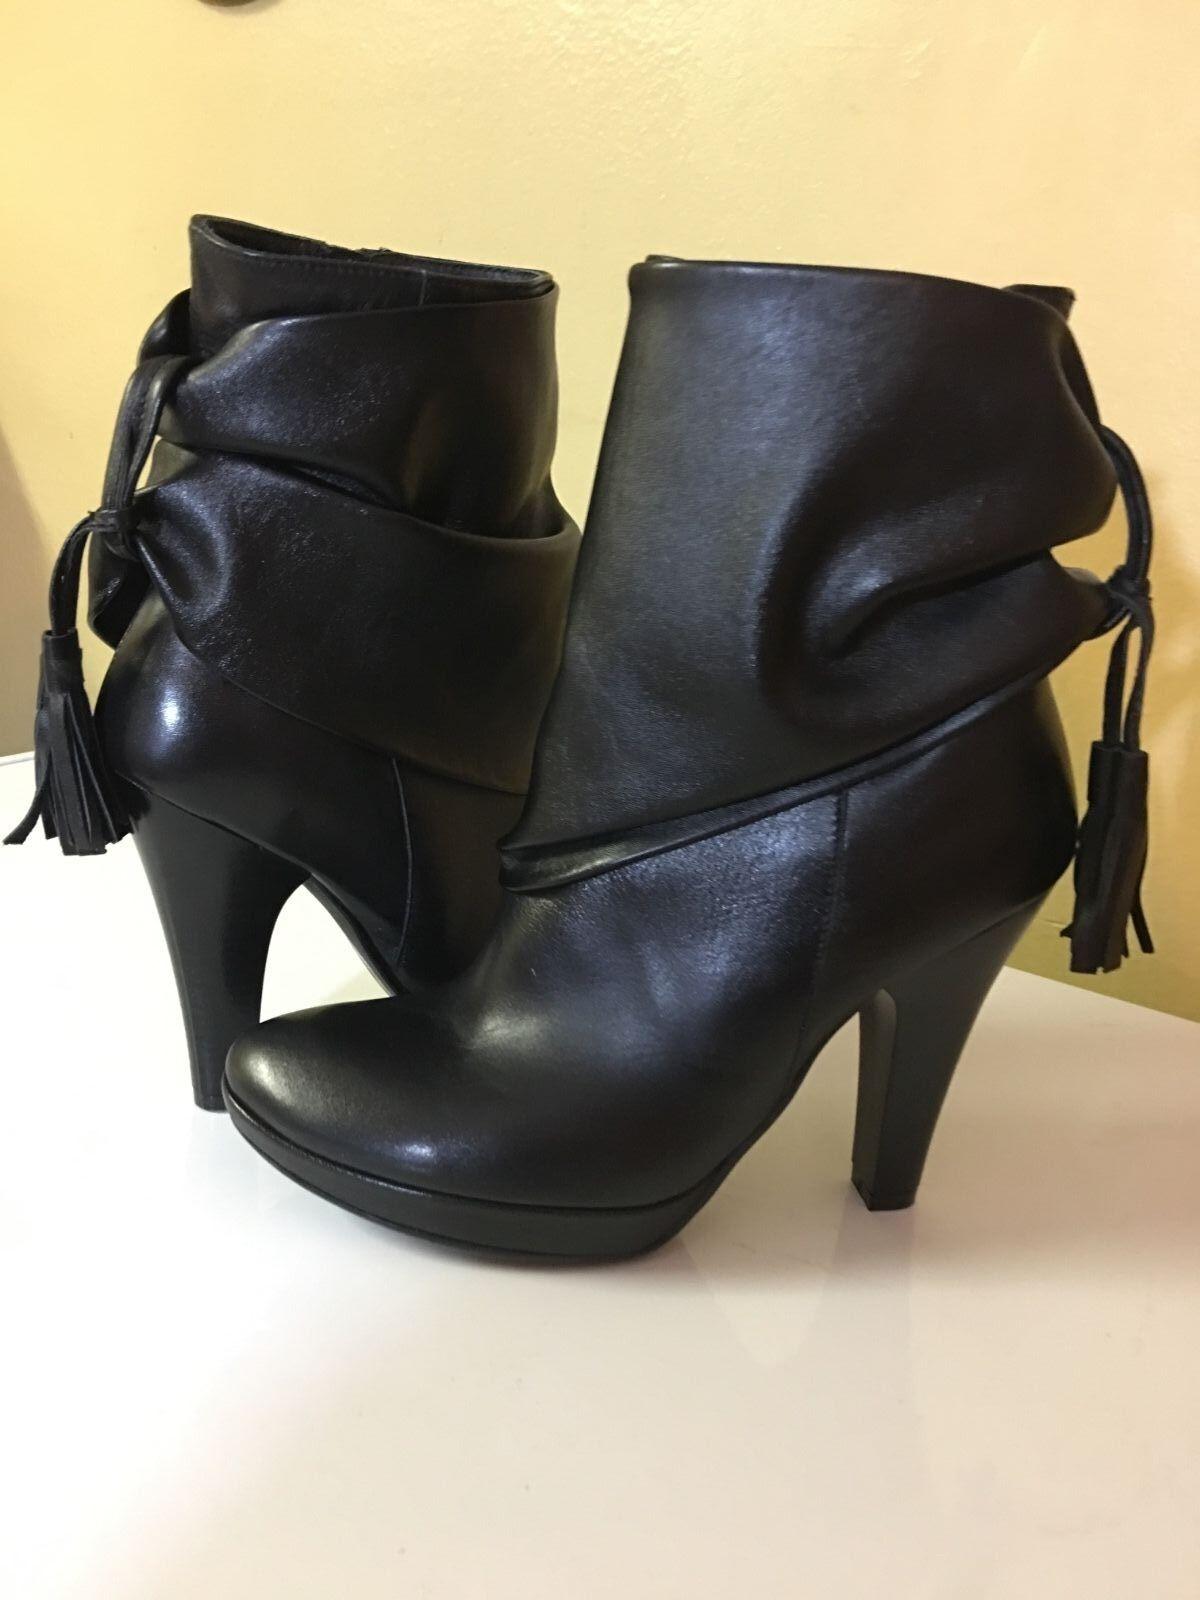 QUAZI WOMEN'S WOMEN'S WOMEN'S BLACK BOOTS SZ EU 37 US 6.5 6f2382